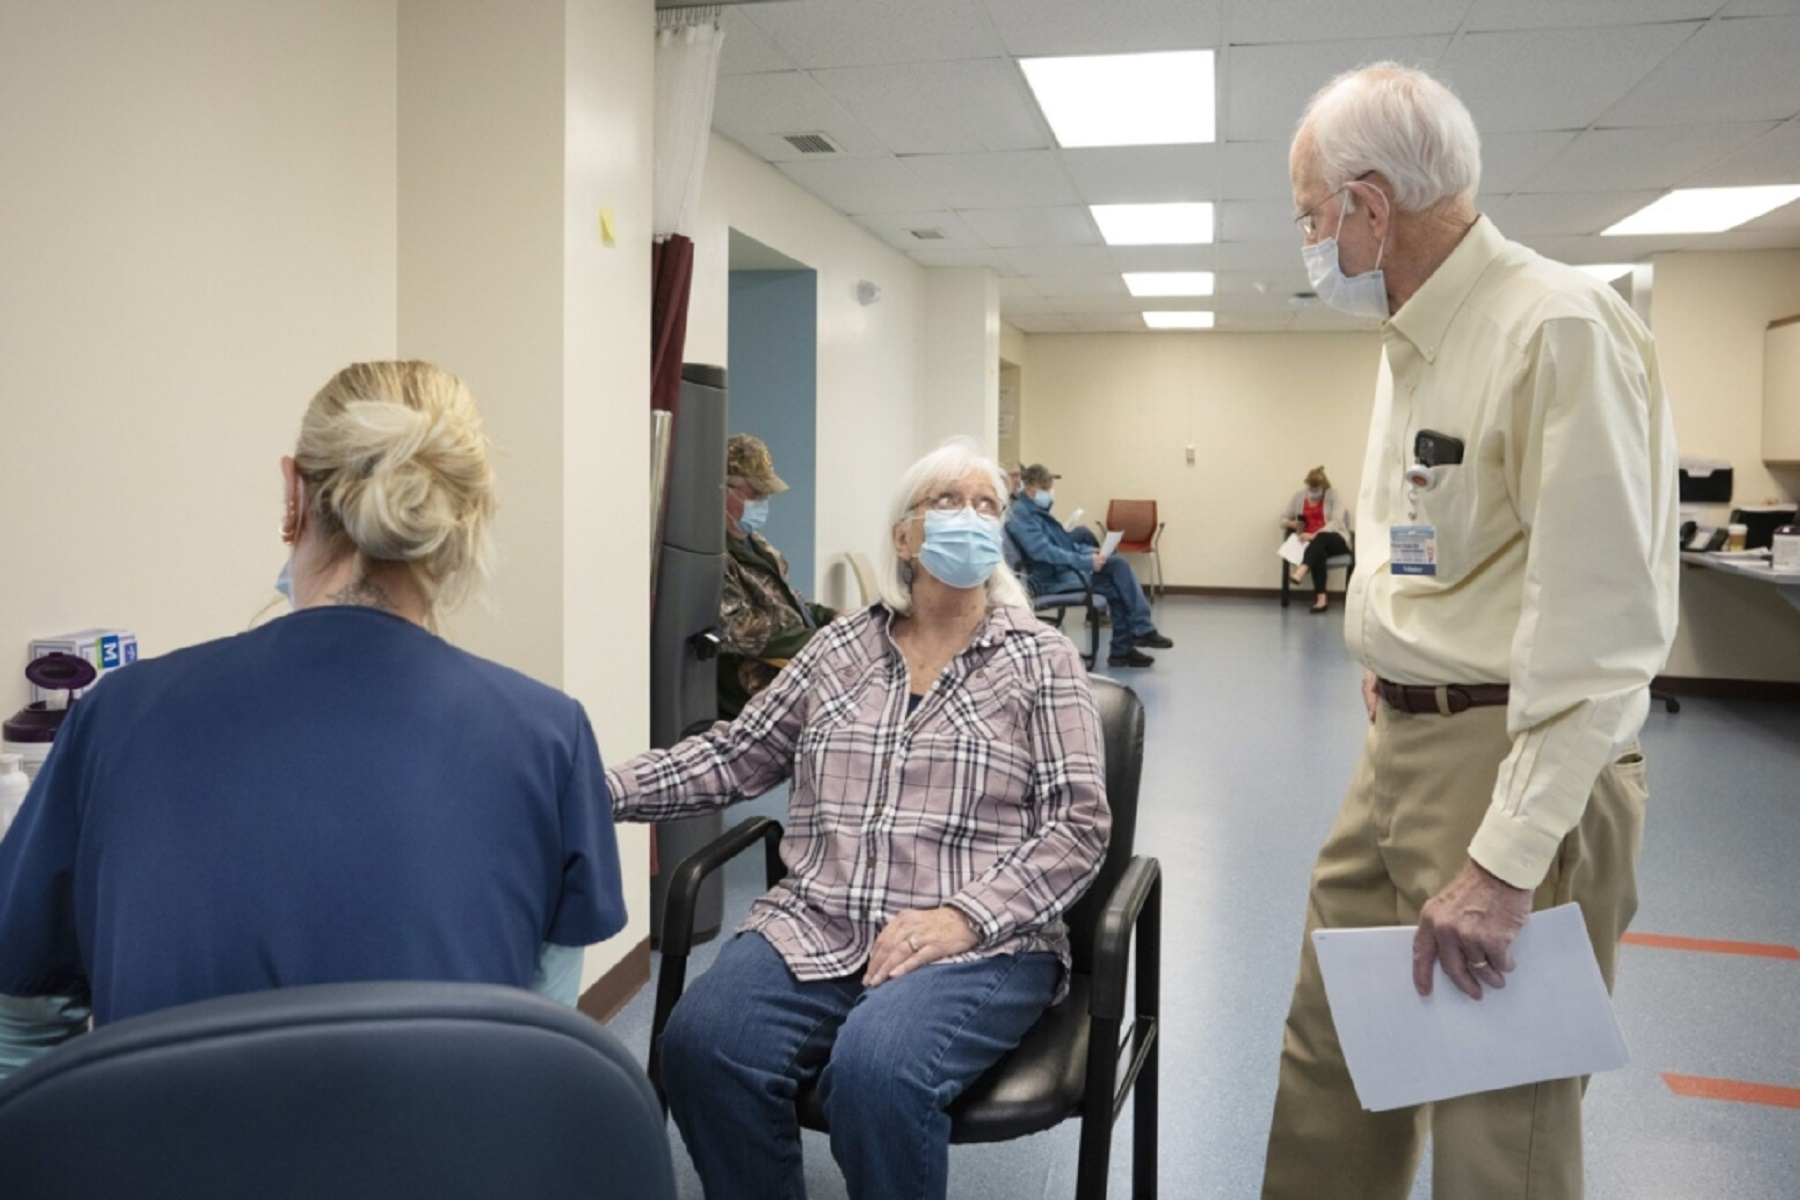 Maine CDC: Εκπρόσωπος λέει ότι 8 εμβολιασμένοι κάτοικοι πέθαναν «με covid – 19»